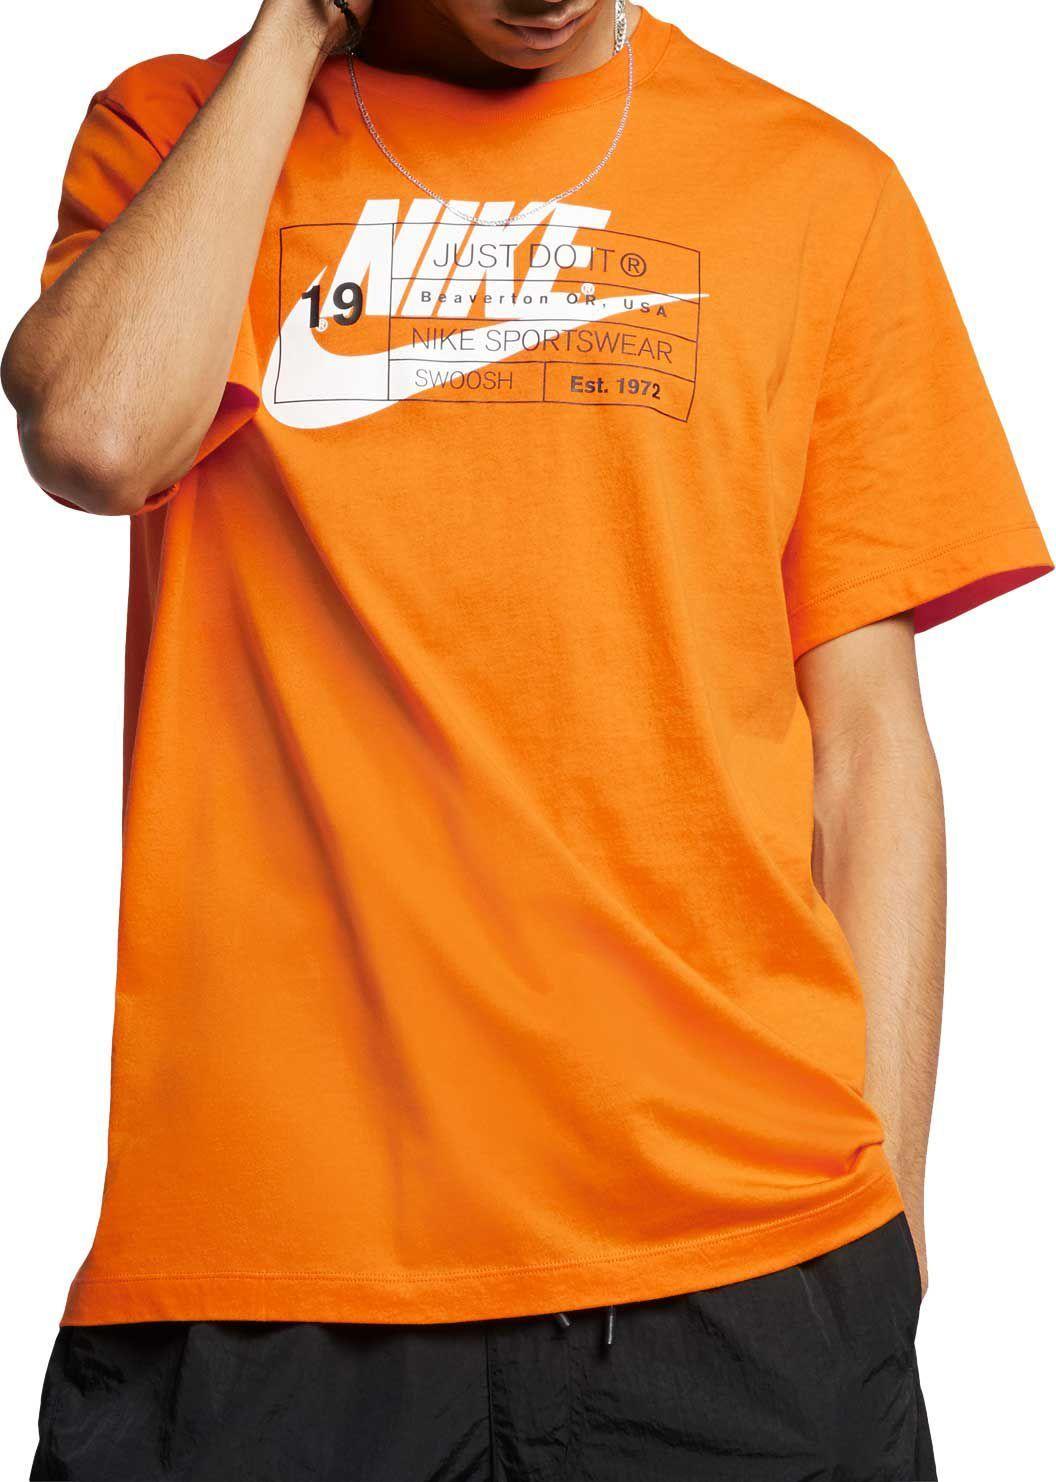 1a954336c9364 Nike Men's Sportswear Story Graphic Tee, Size: XXL, White in 2019 ...